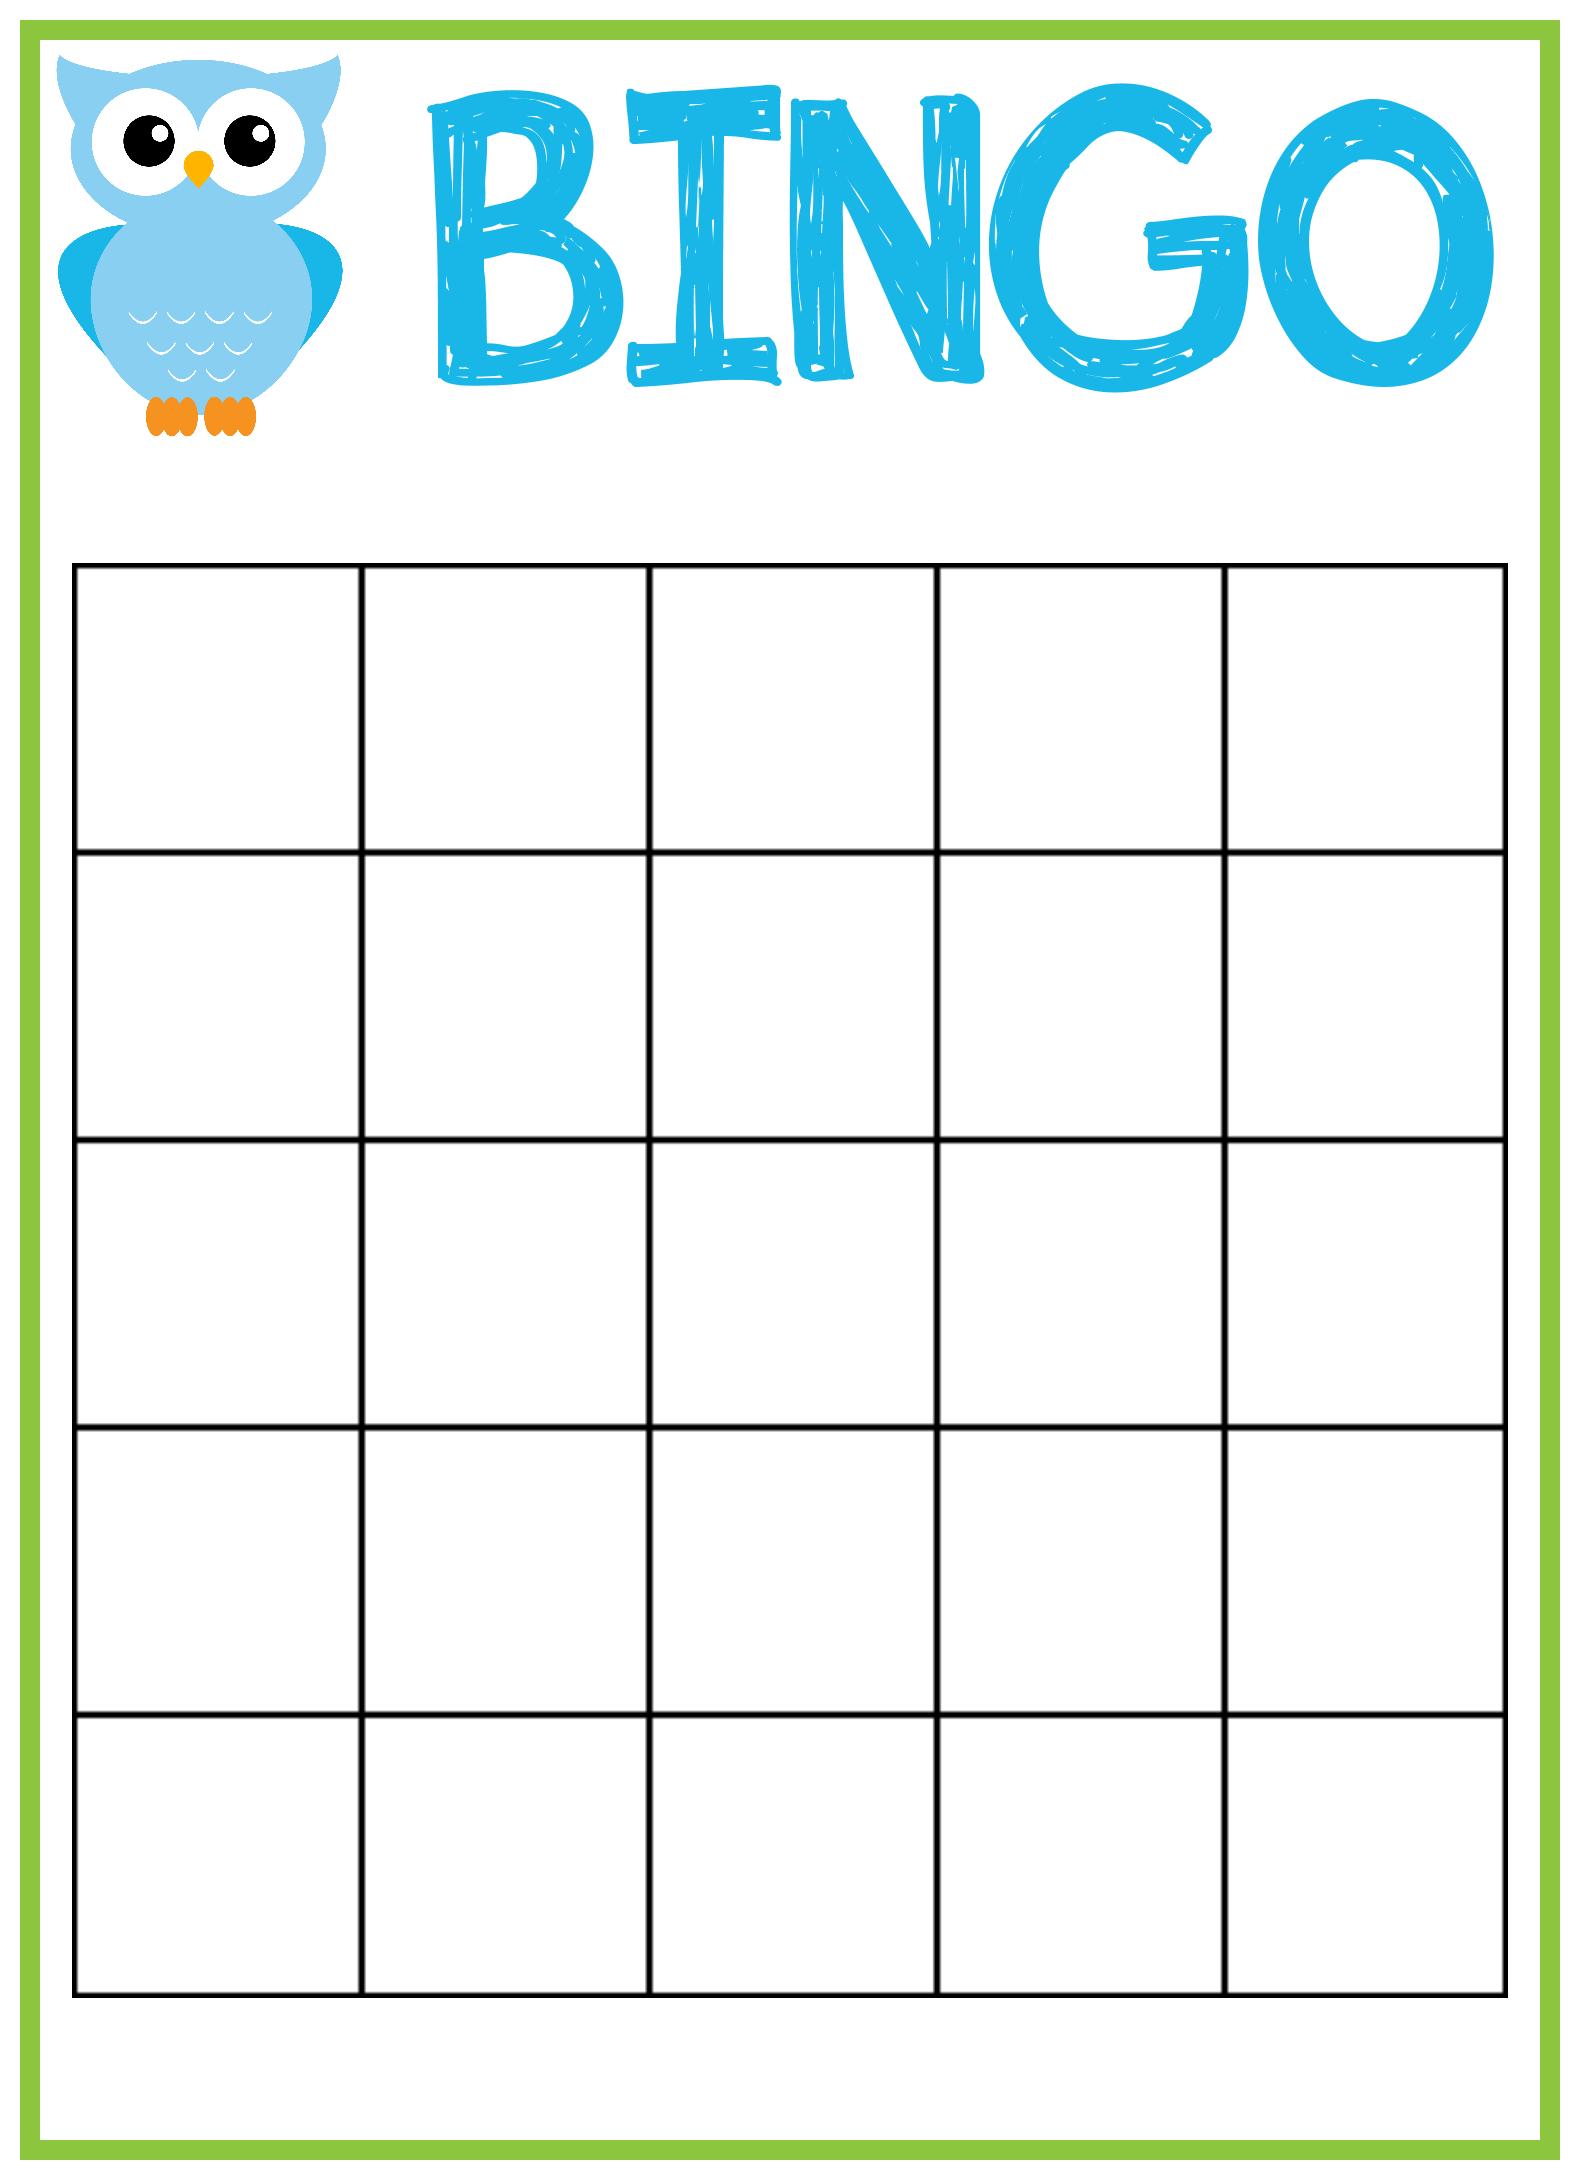 Printed bingo cards